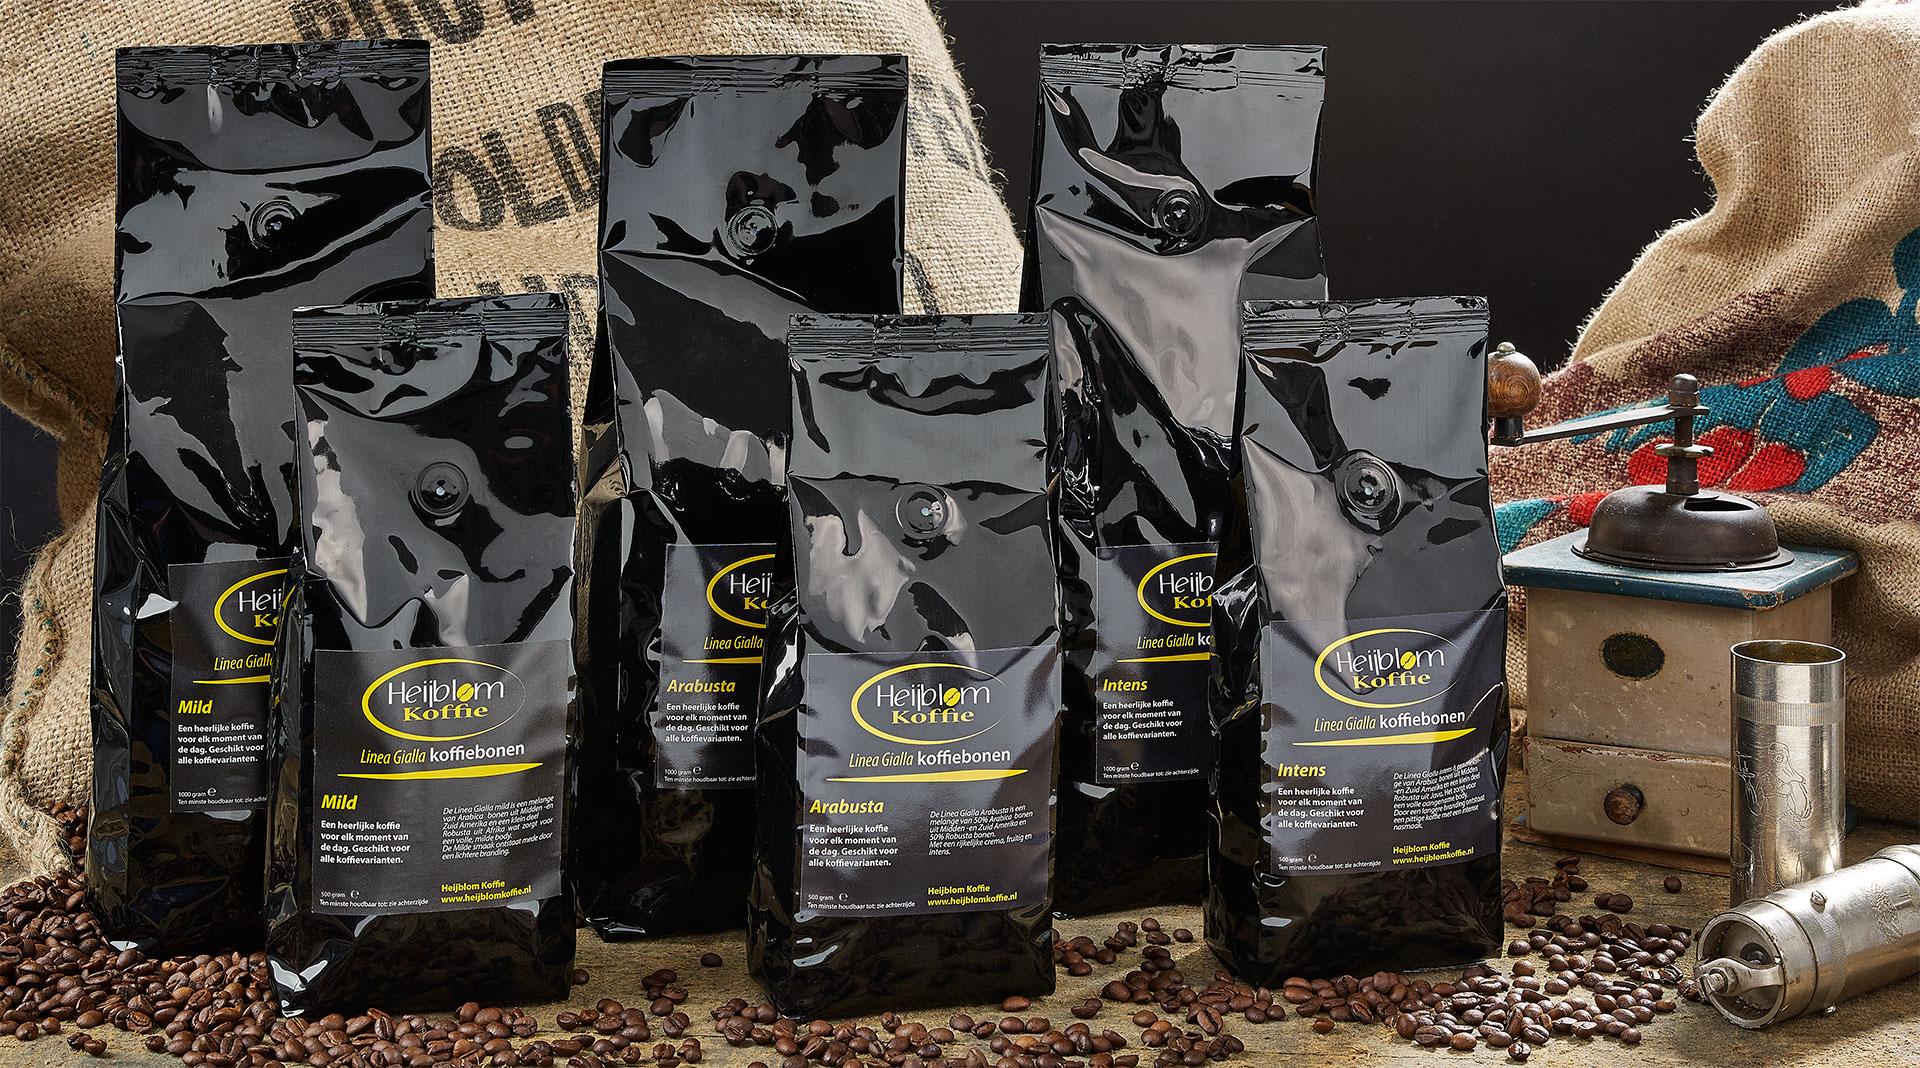 linea gialla espresso Heijblom koffie